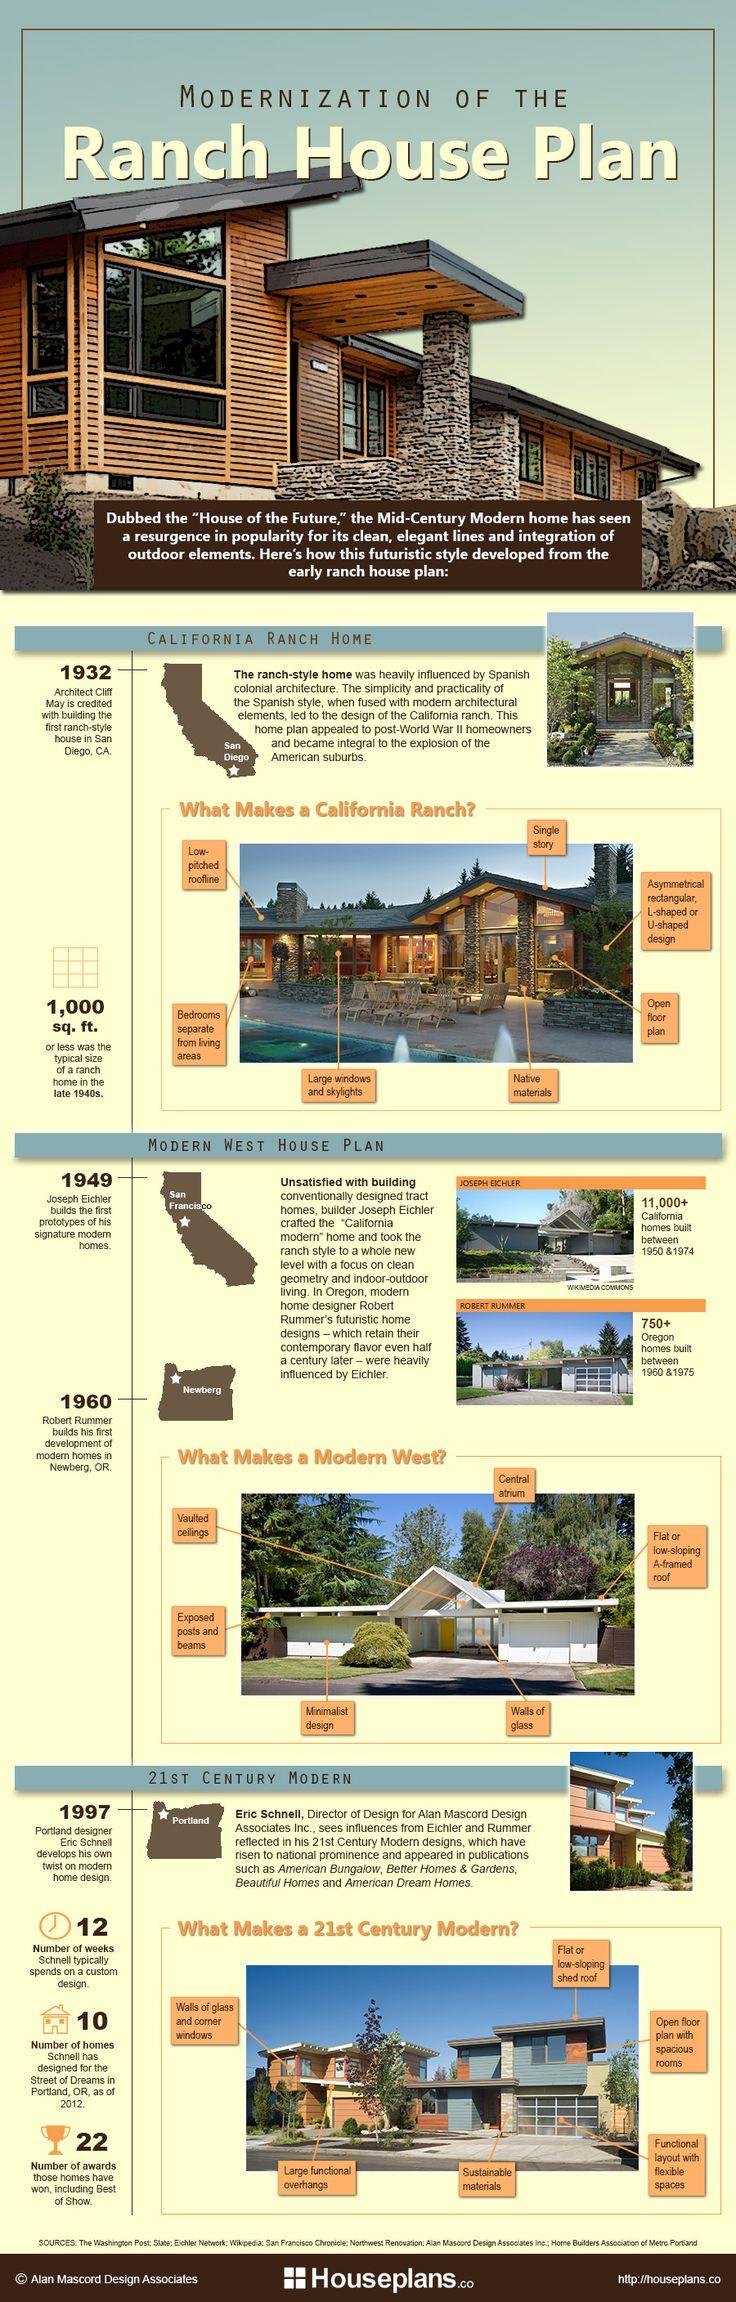 Modernization of the Ranch House Plan